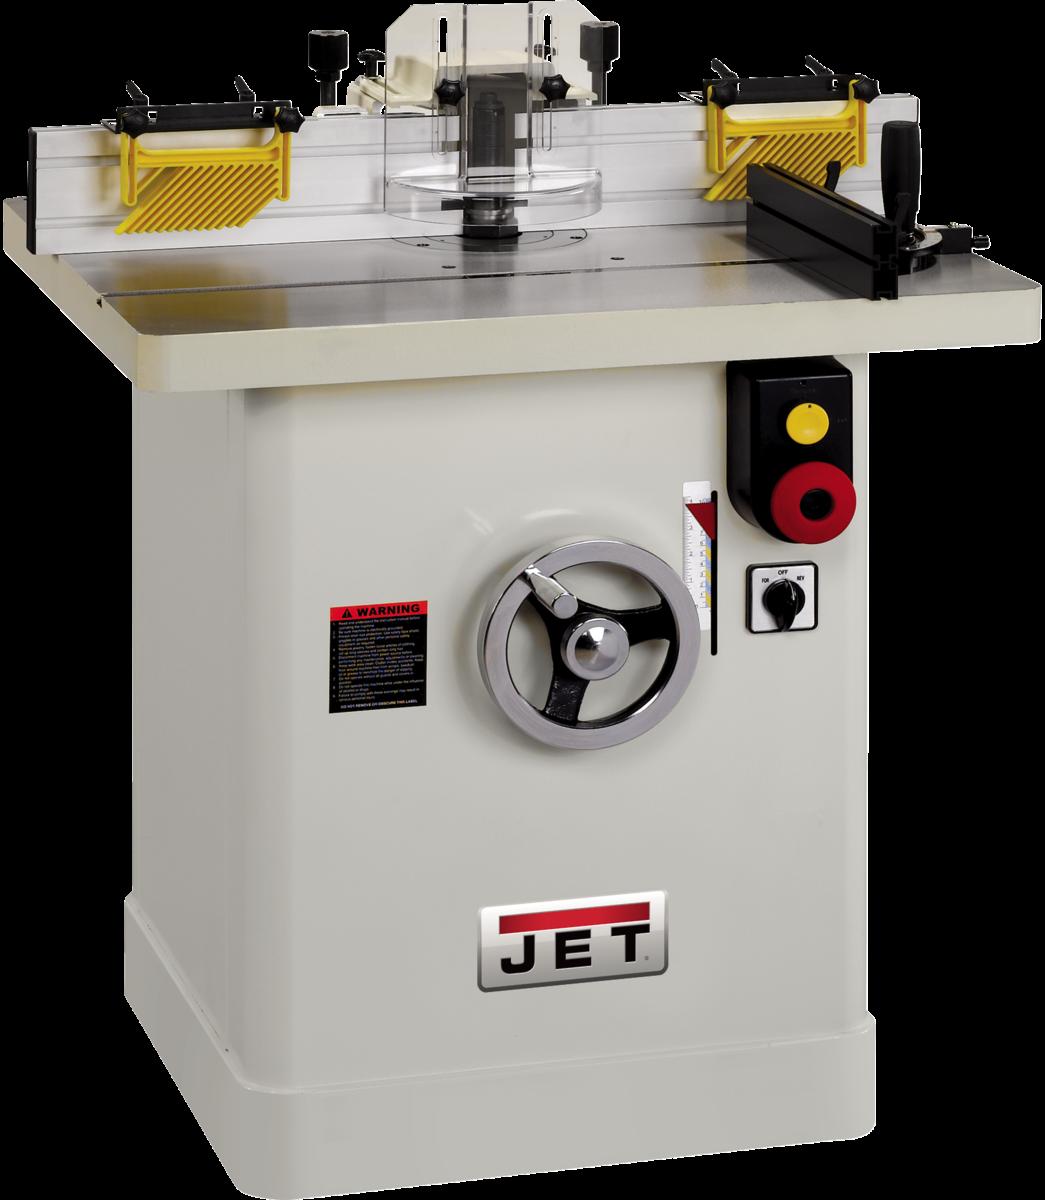 JWS-35X5-1 Industrial Shaper 5HP, 1Ph